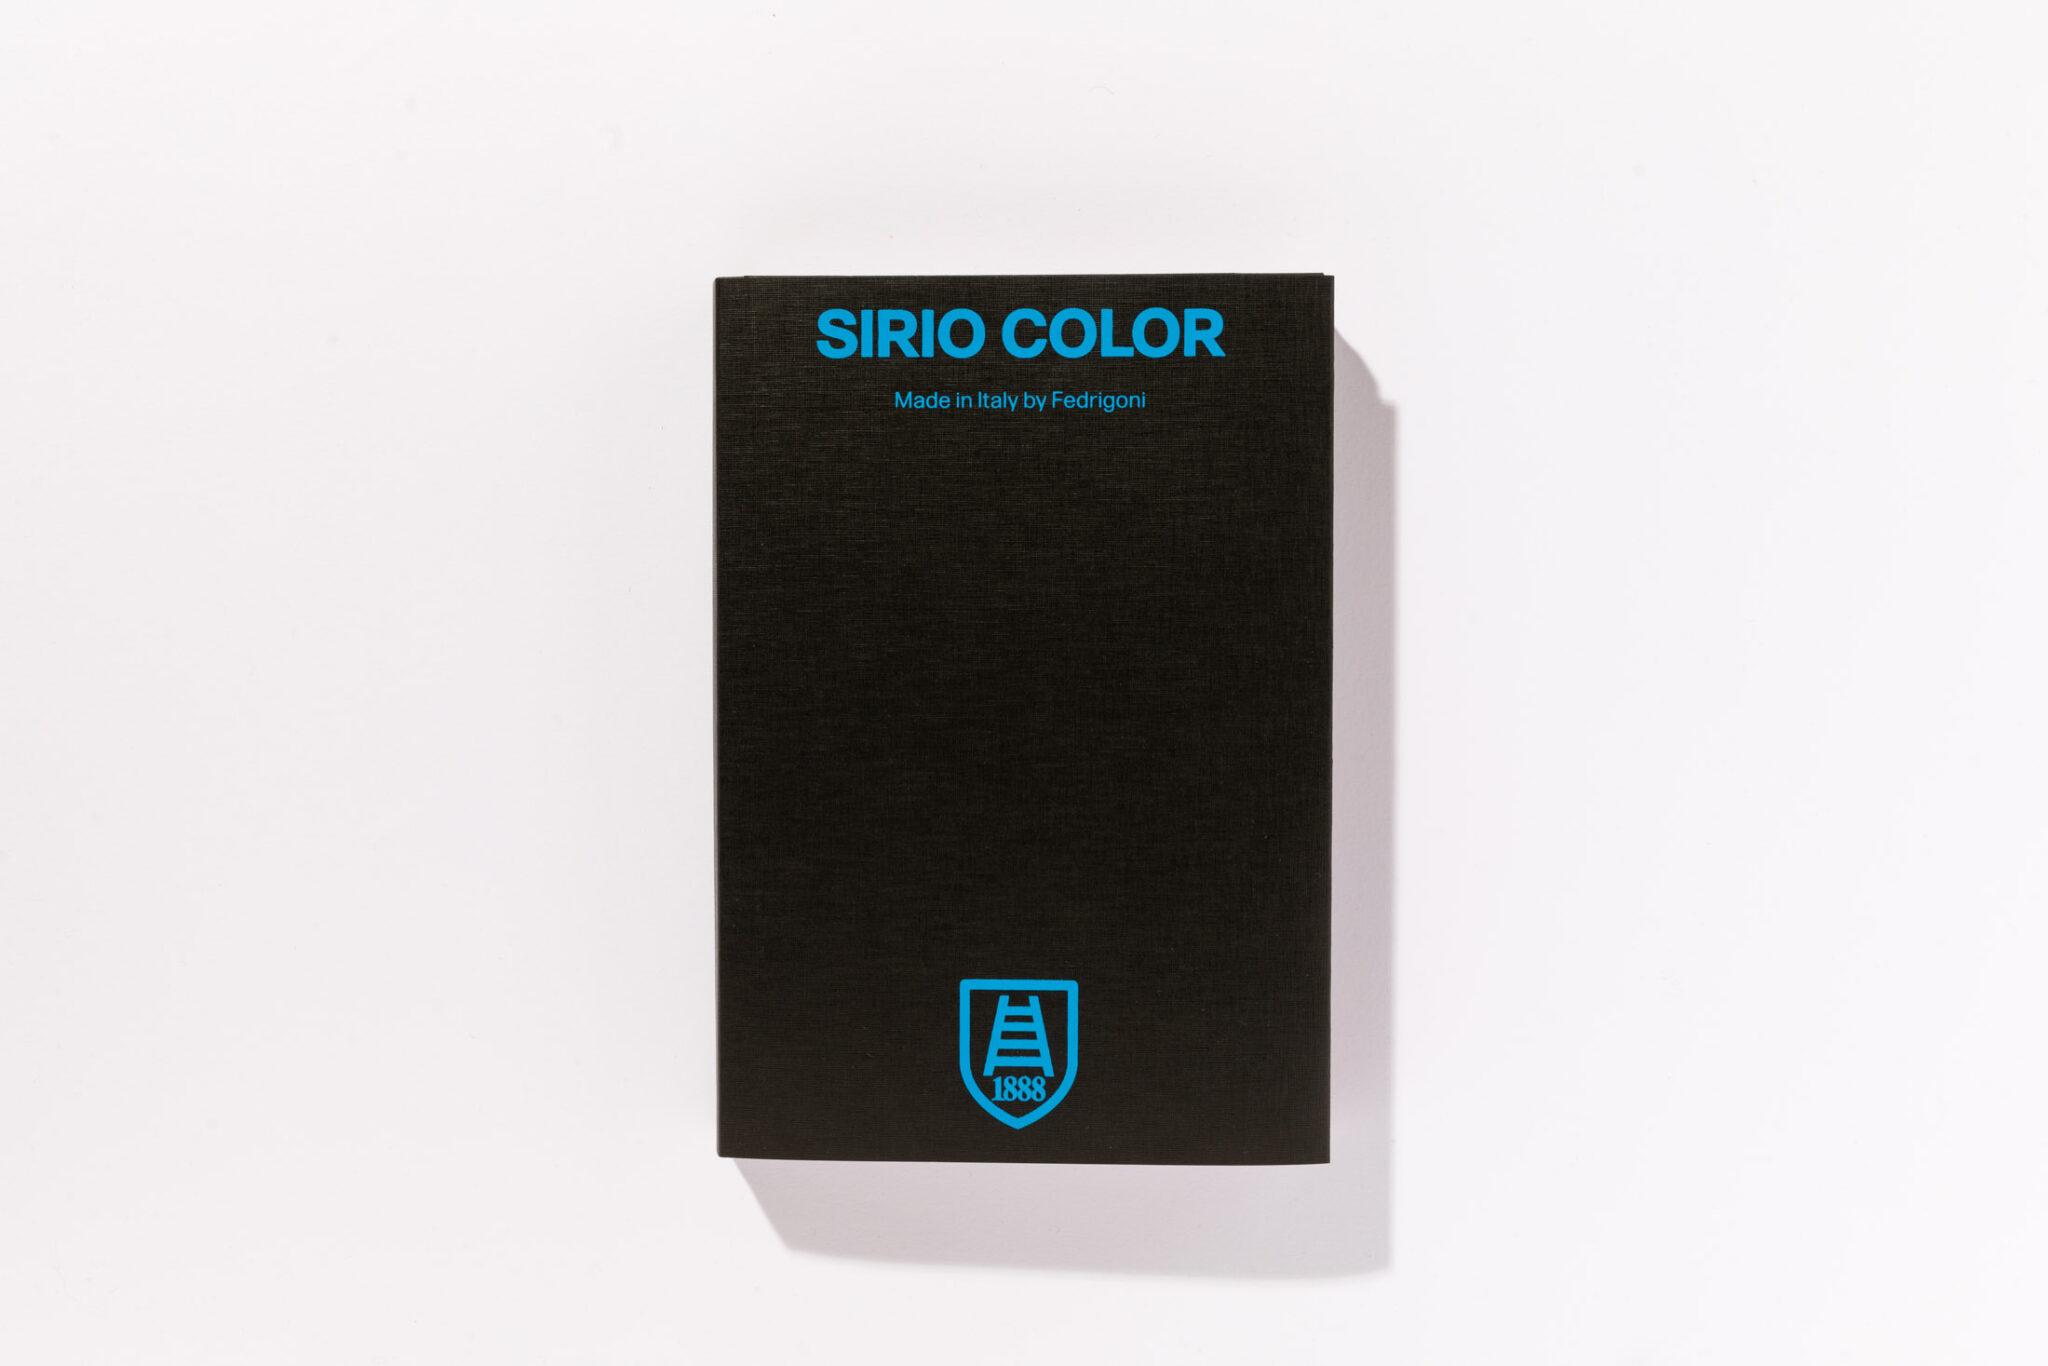 Sirio Color